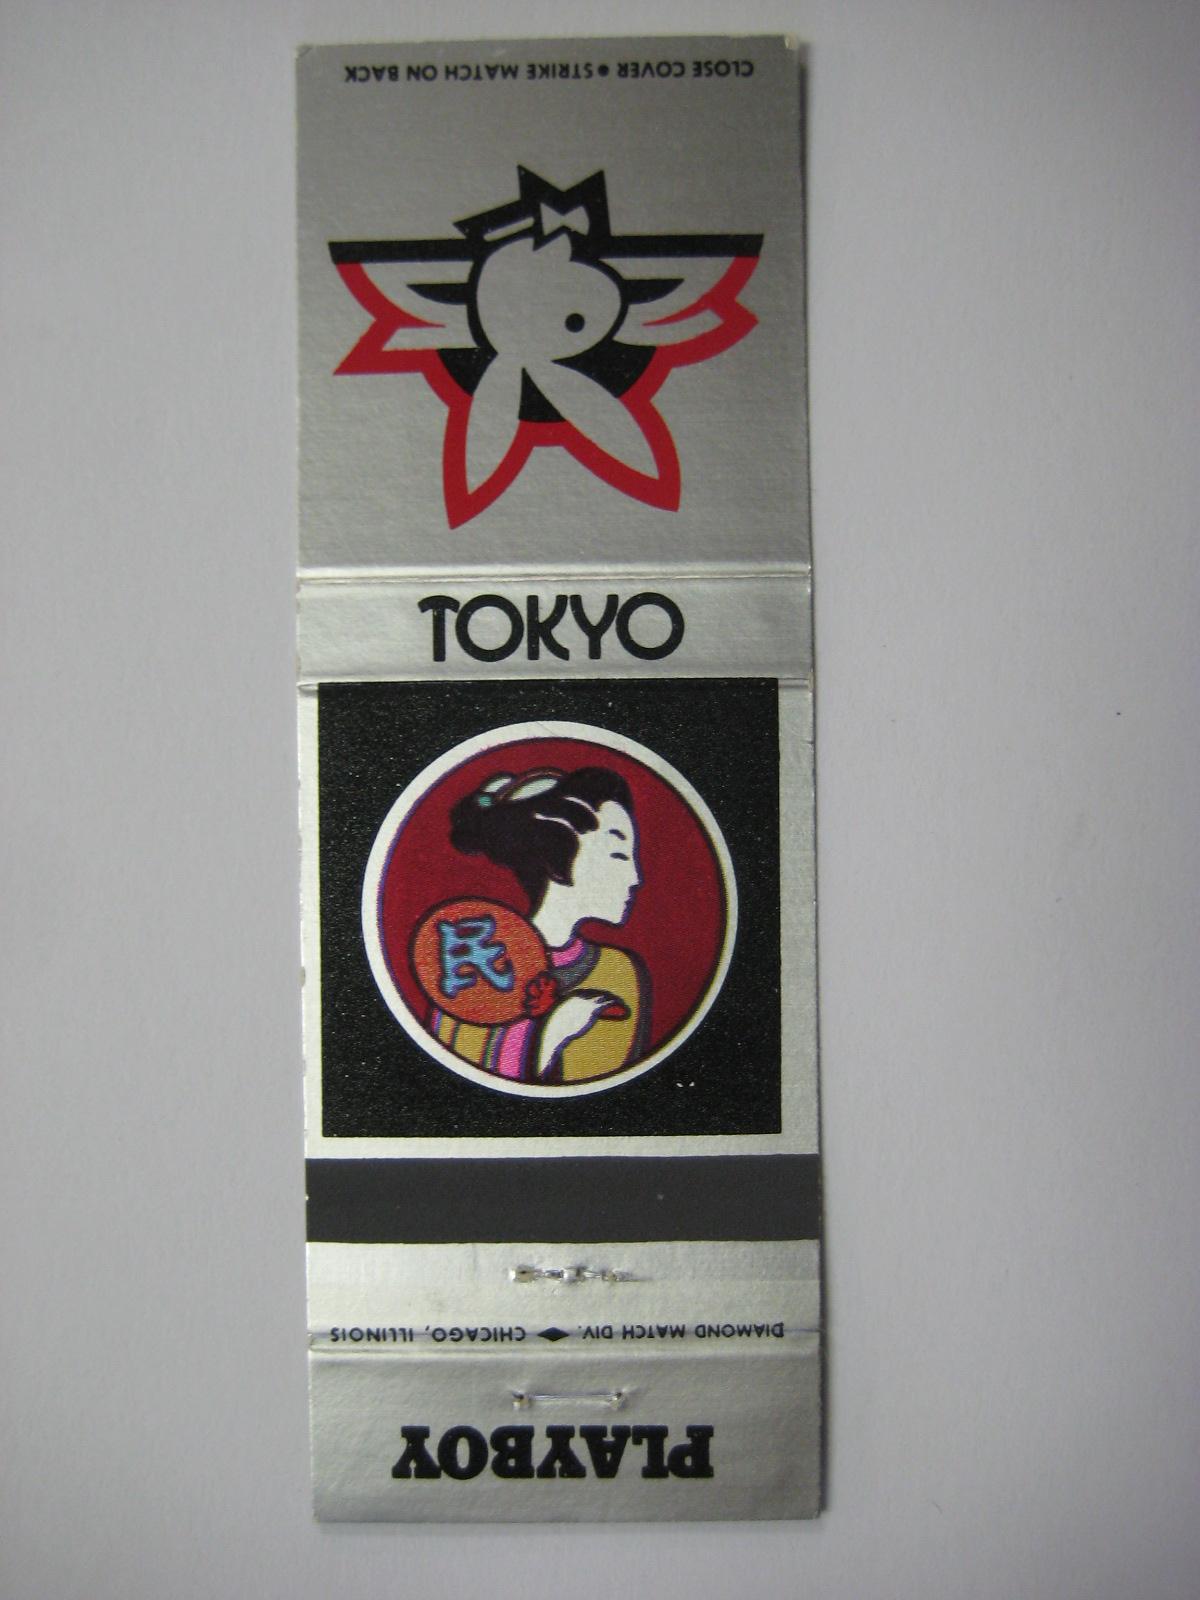 Tokyo 25 anniversary Playboy Club Matches